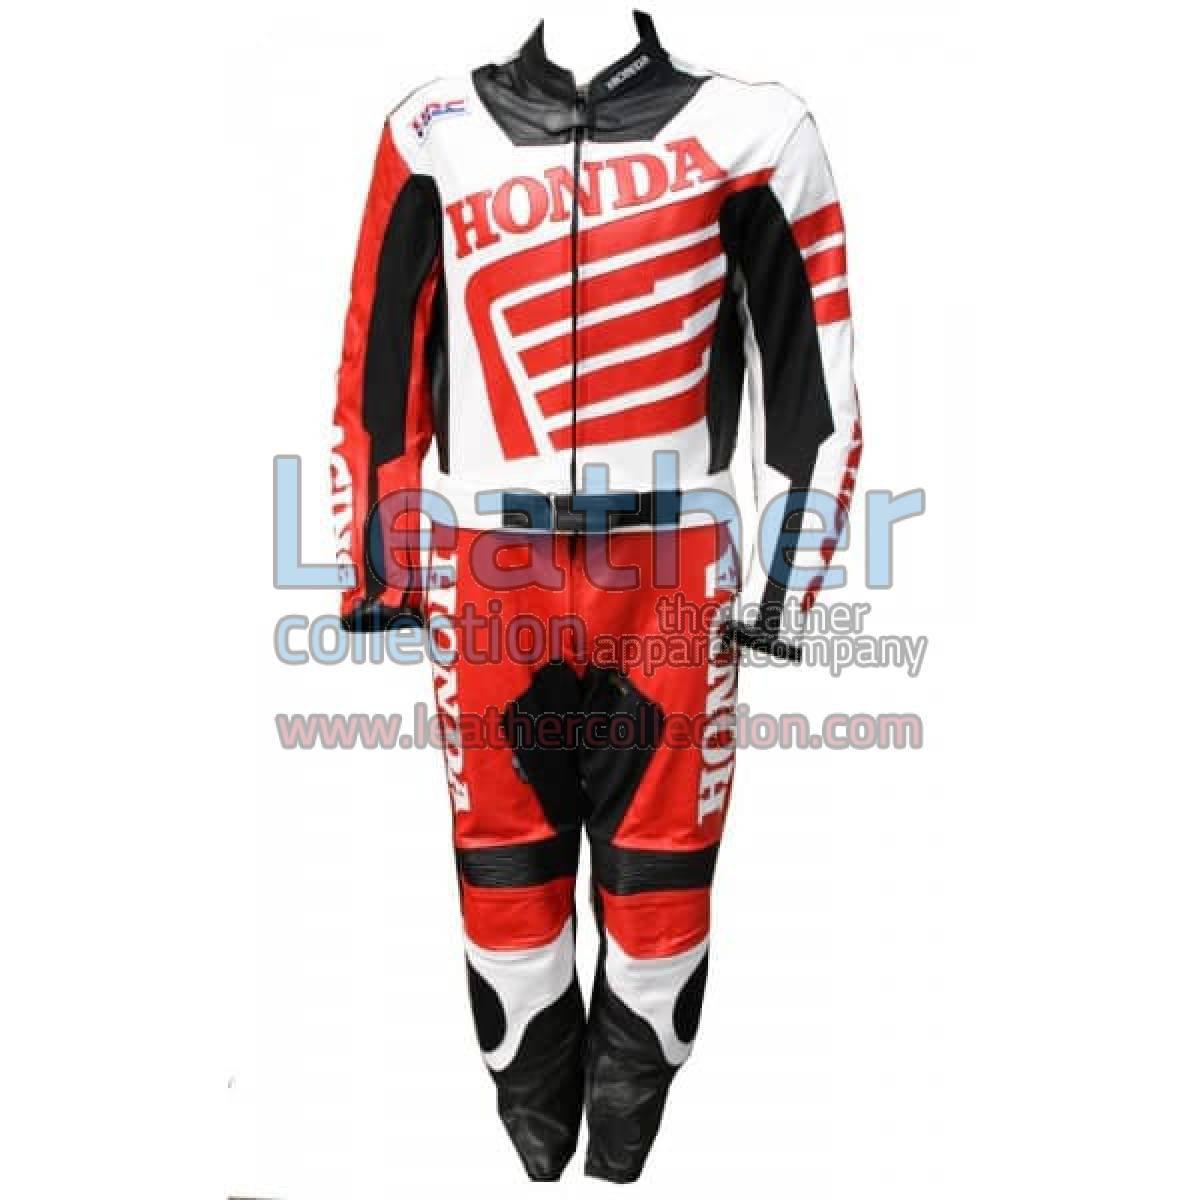 Honda Motorbike Racing Leather Suit